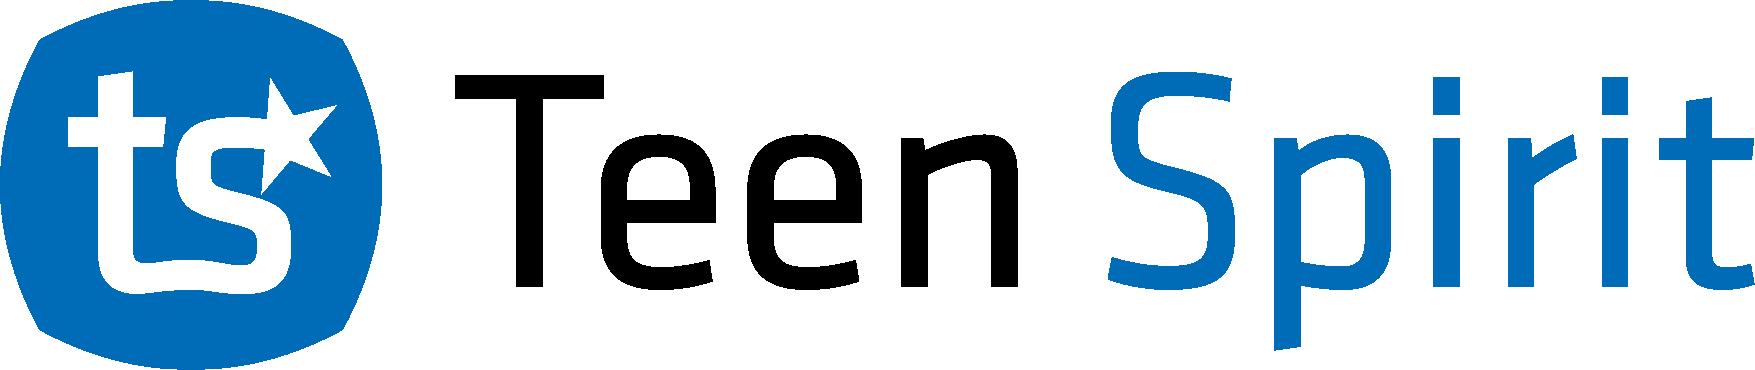 TeenSprit_logo